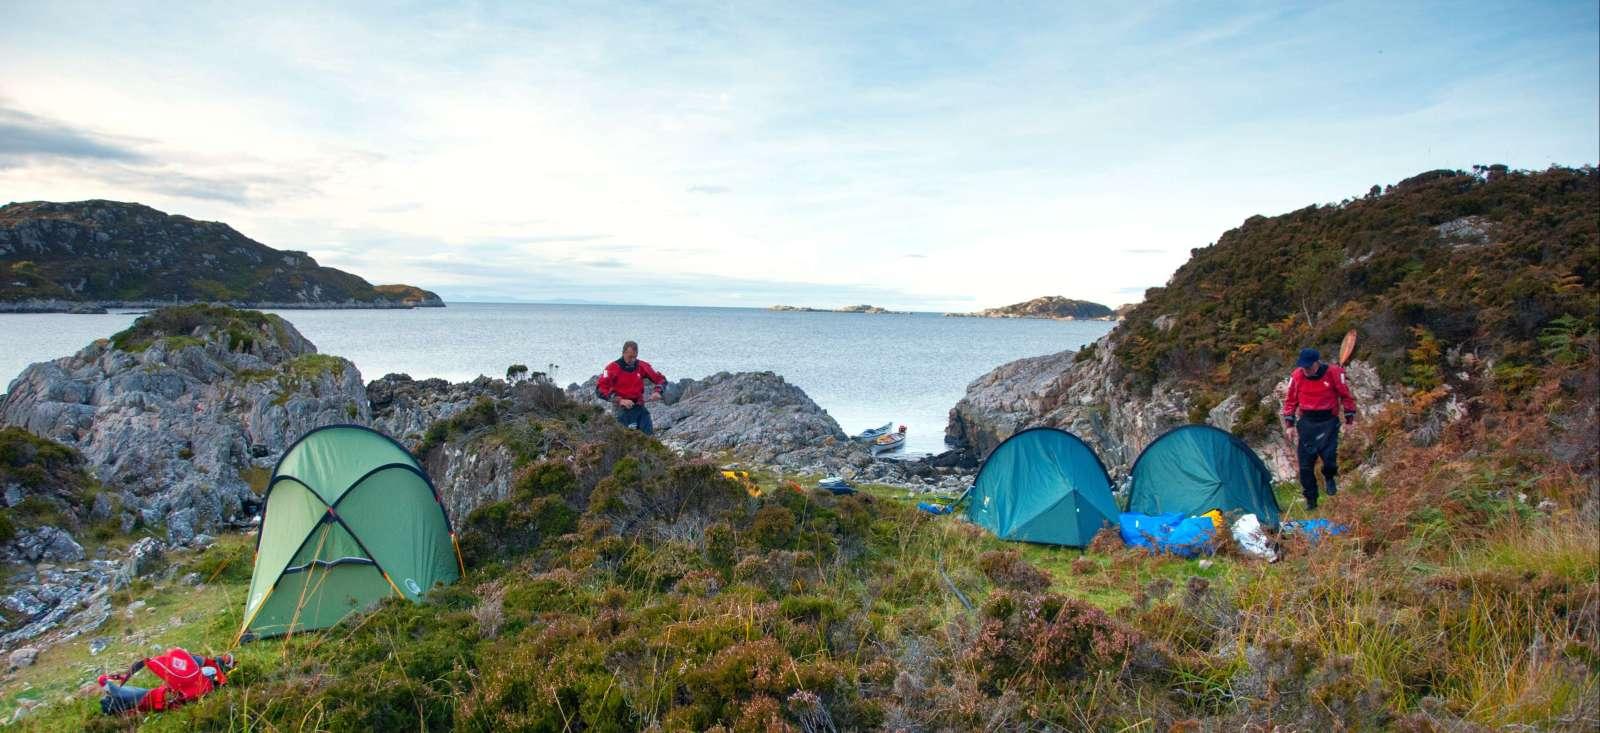 Voyage en kayak : Kayak et rando des Summer Isles au Ben Nevis.